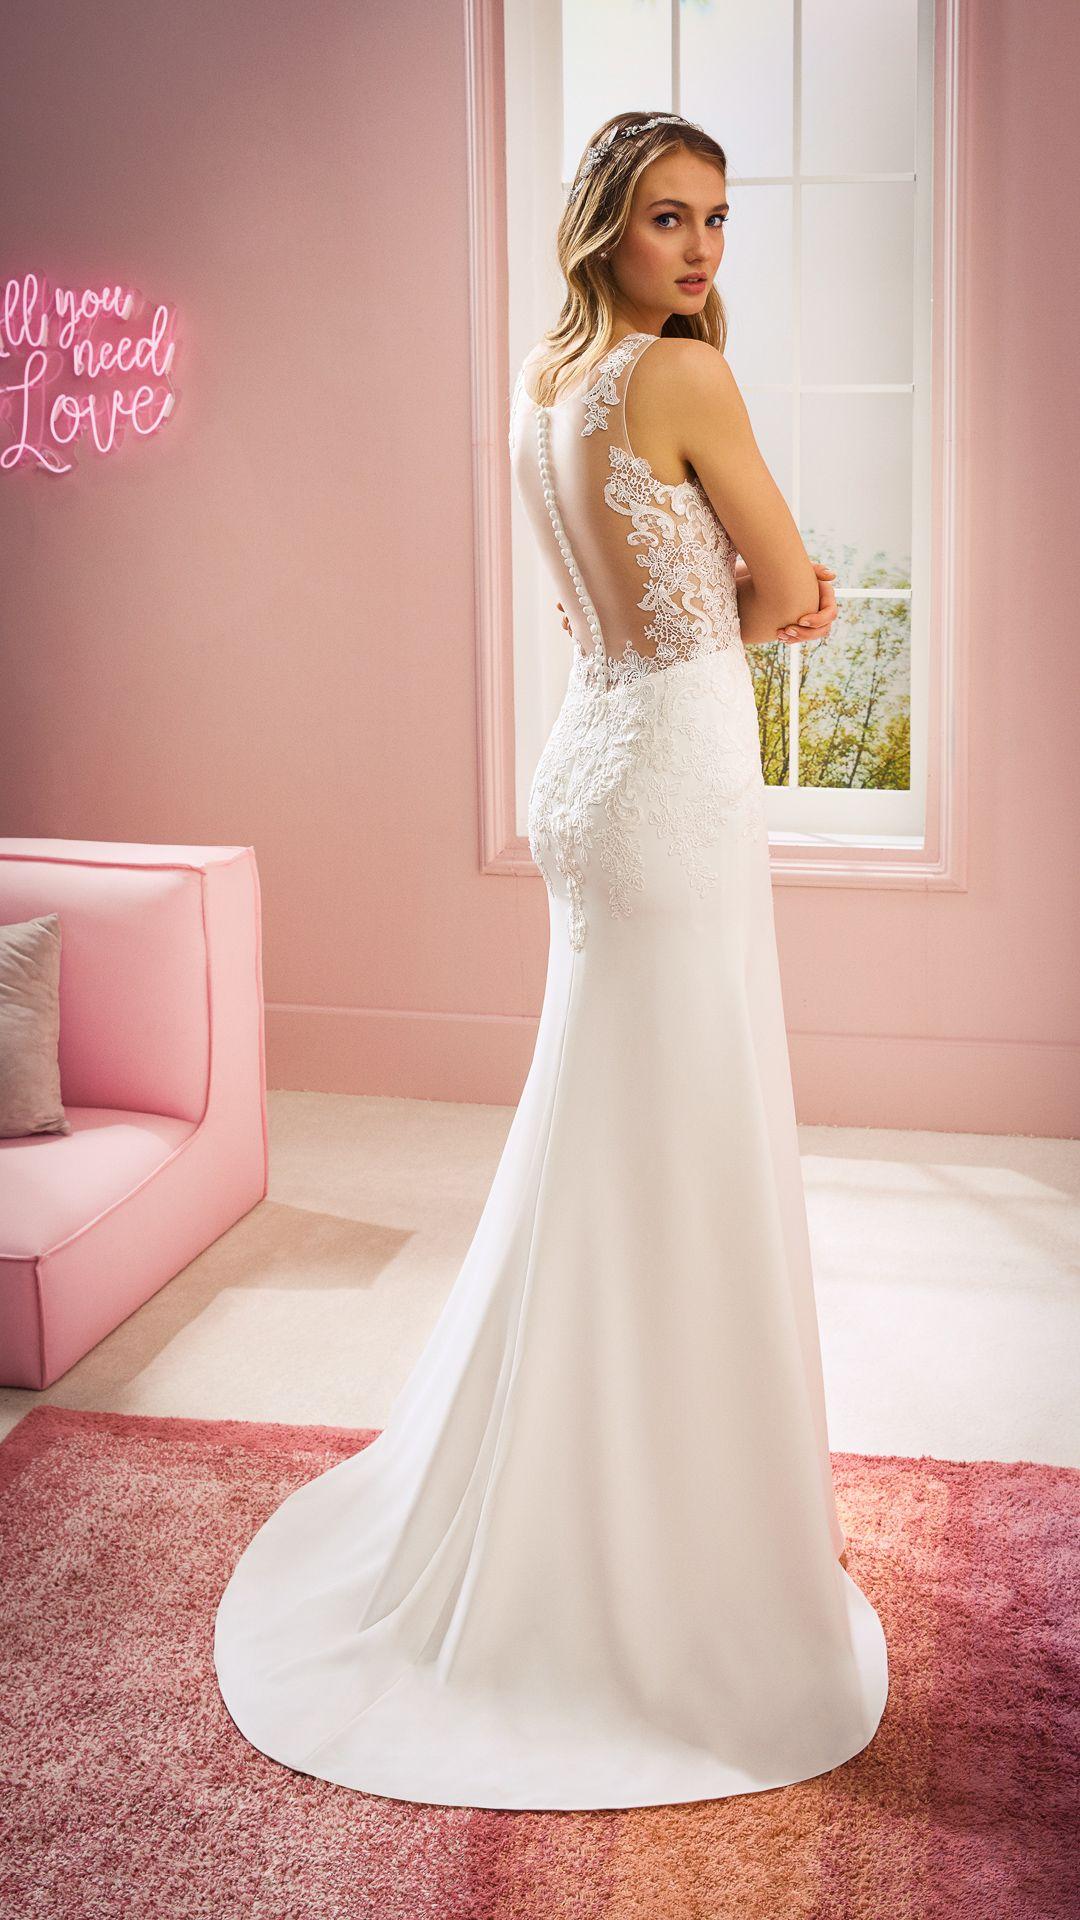 Hochzeitskleider 20 White One Kollektion Modell: FLOHIO-C